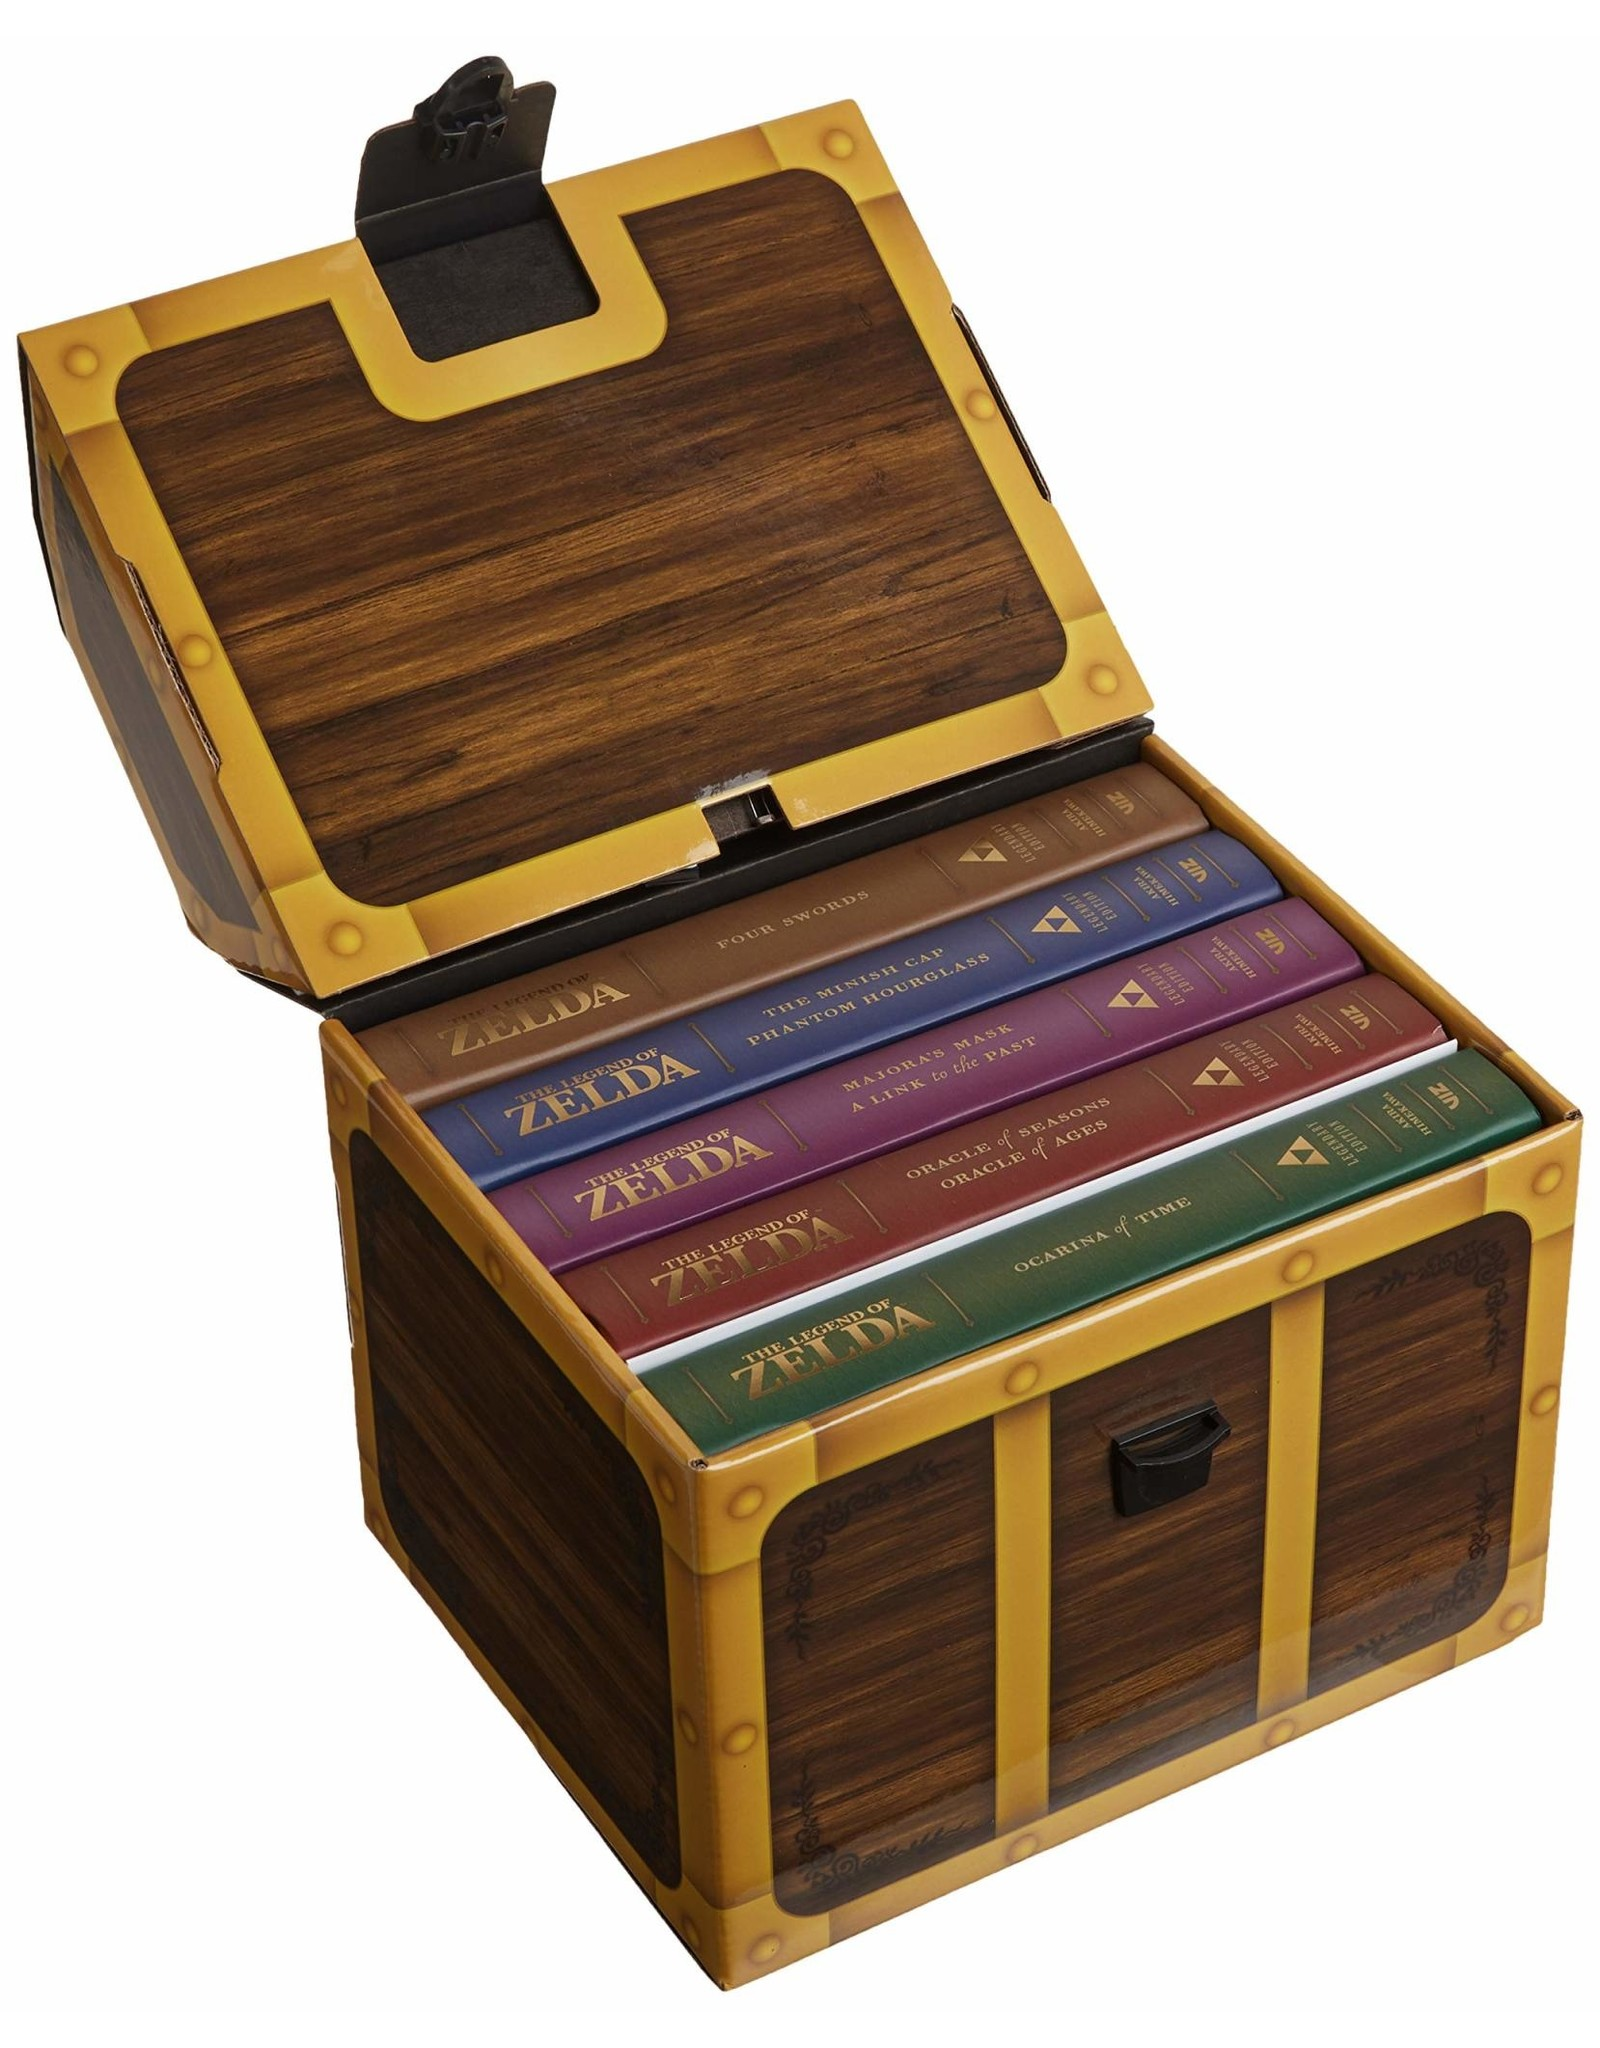 The Legend of Zelda: Legendary Edition Box Set (Engelstalig)